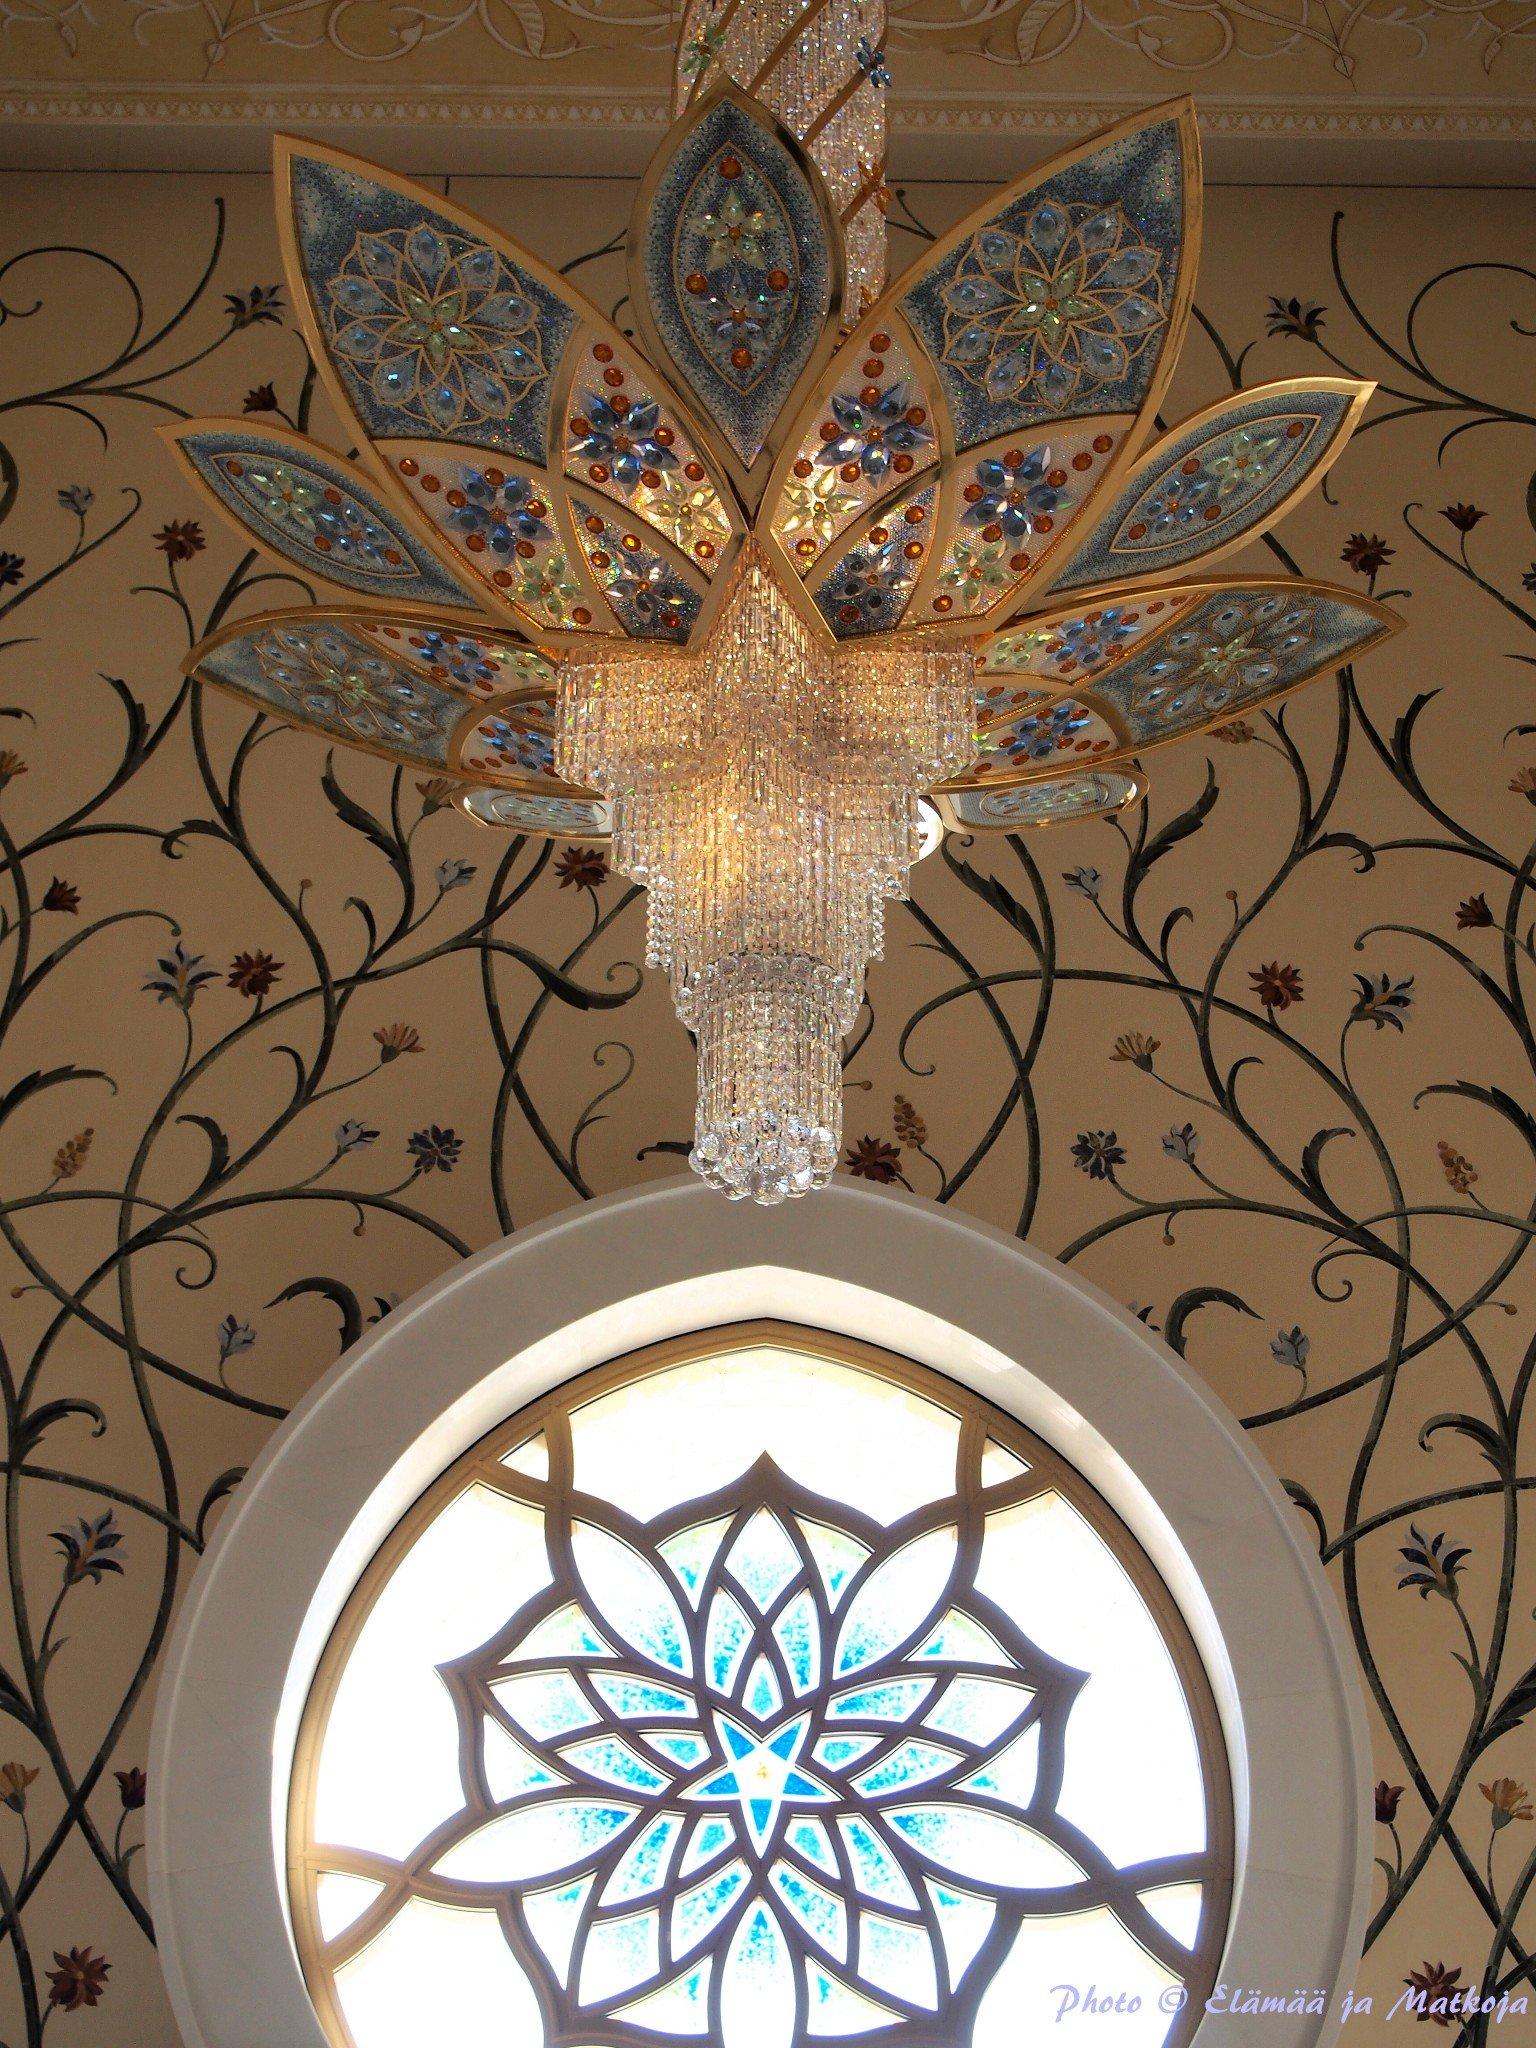 Sheikh Zayed Grand Mosque Abu Dhabi UAE 16 Photo © Elämää ja Matkoja